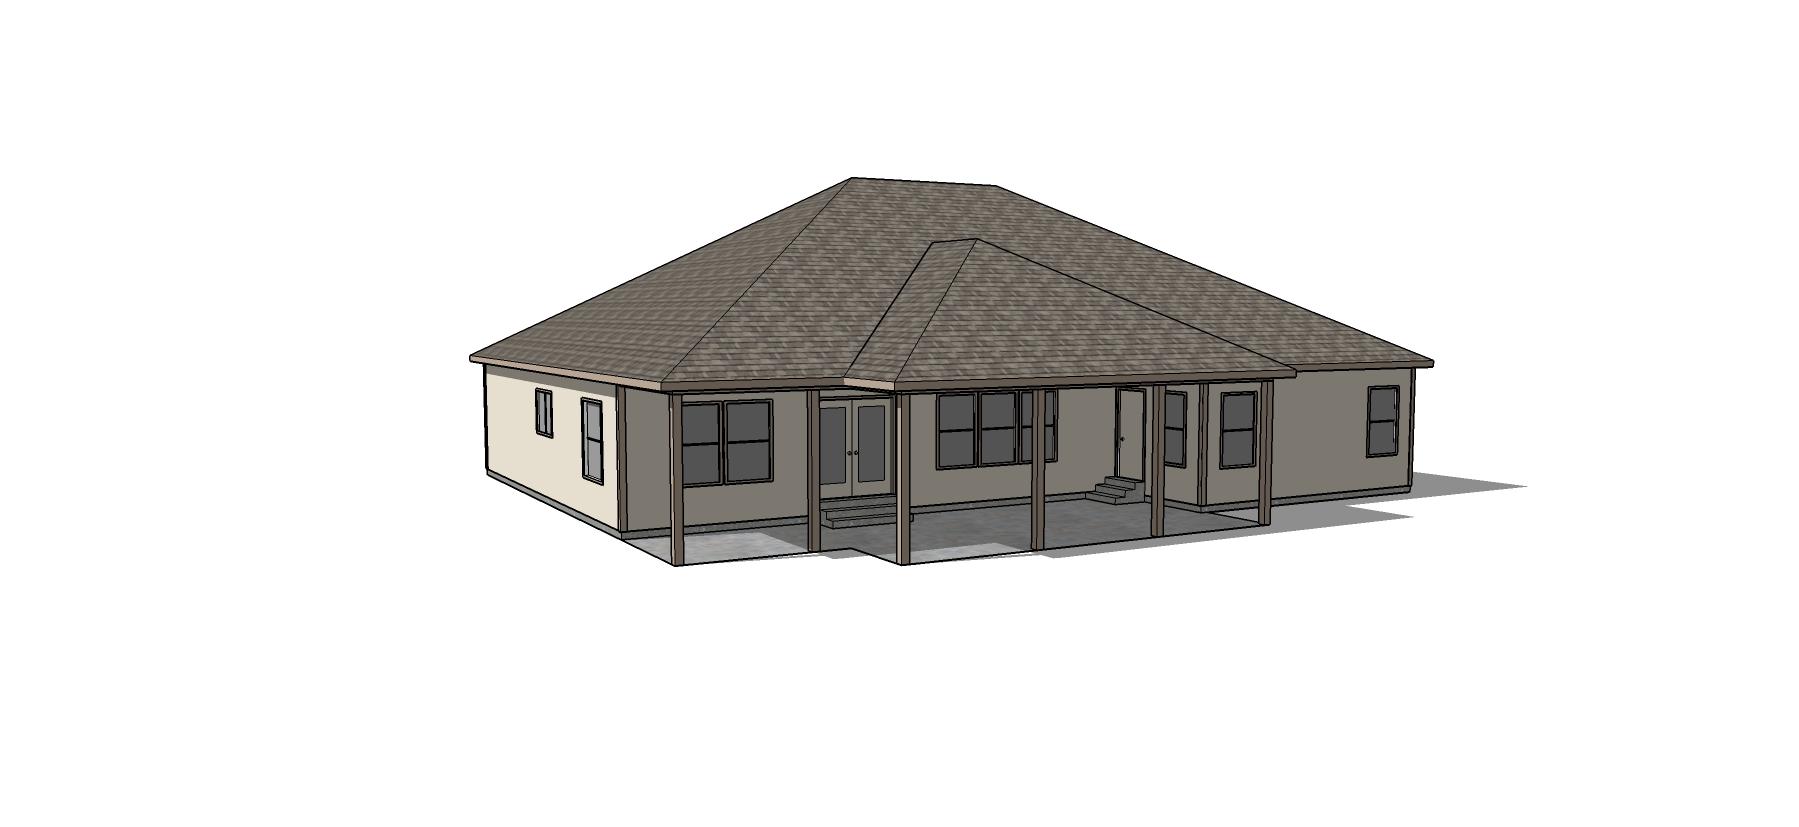 Bohnet showhouse floor plan